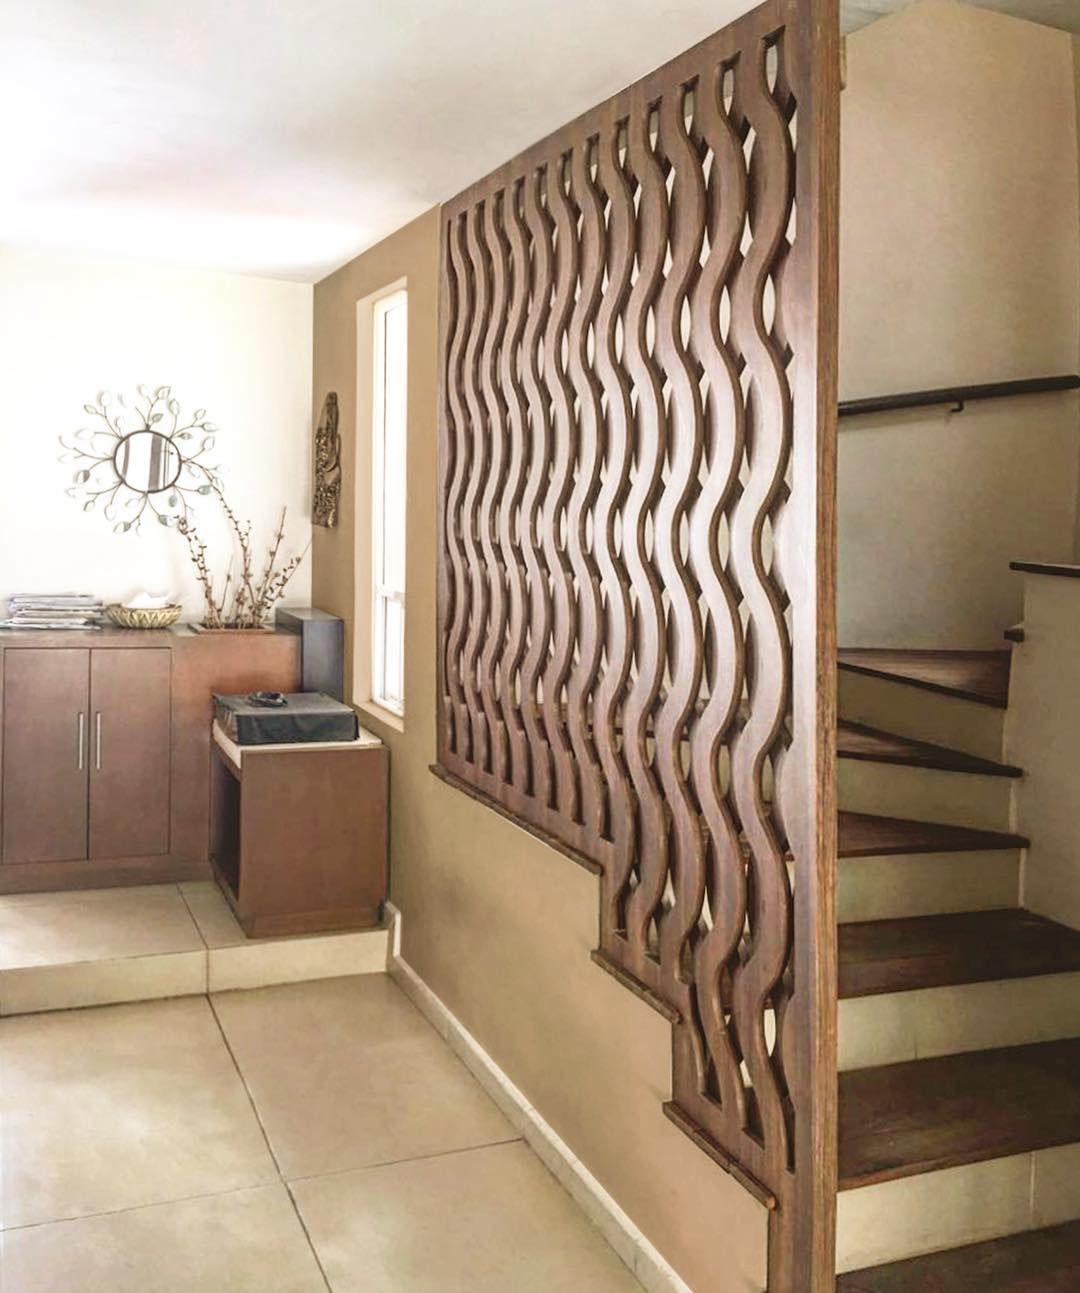 Wavy wood paneling